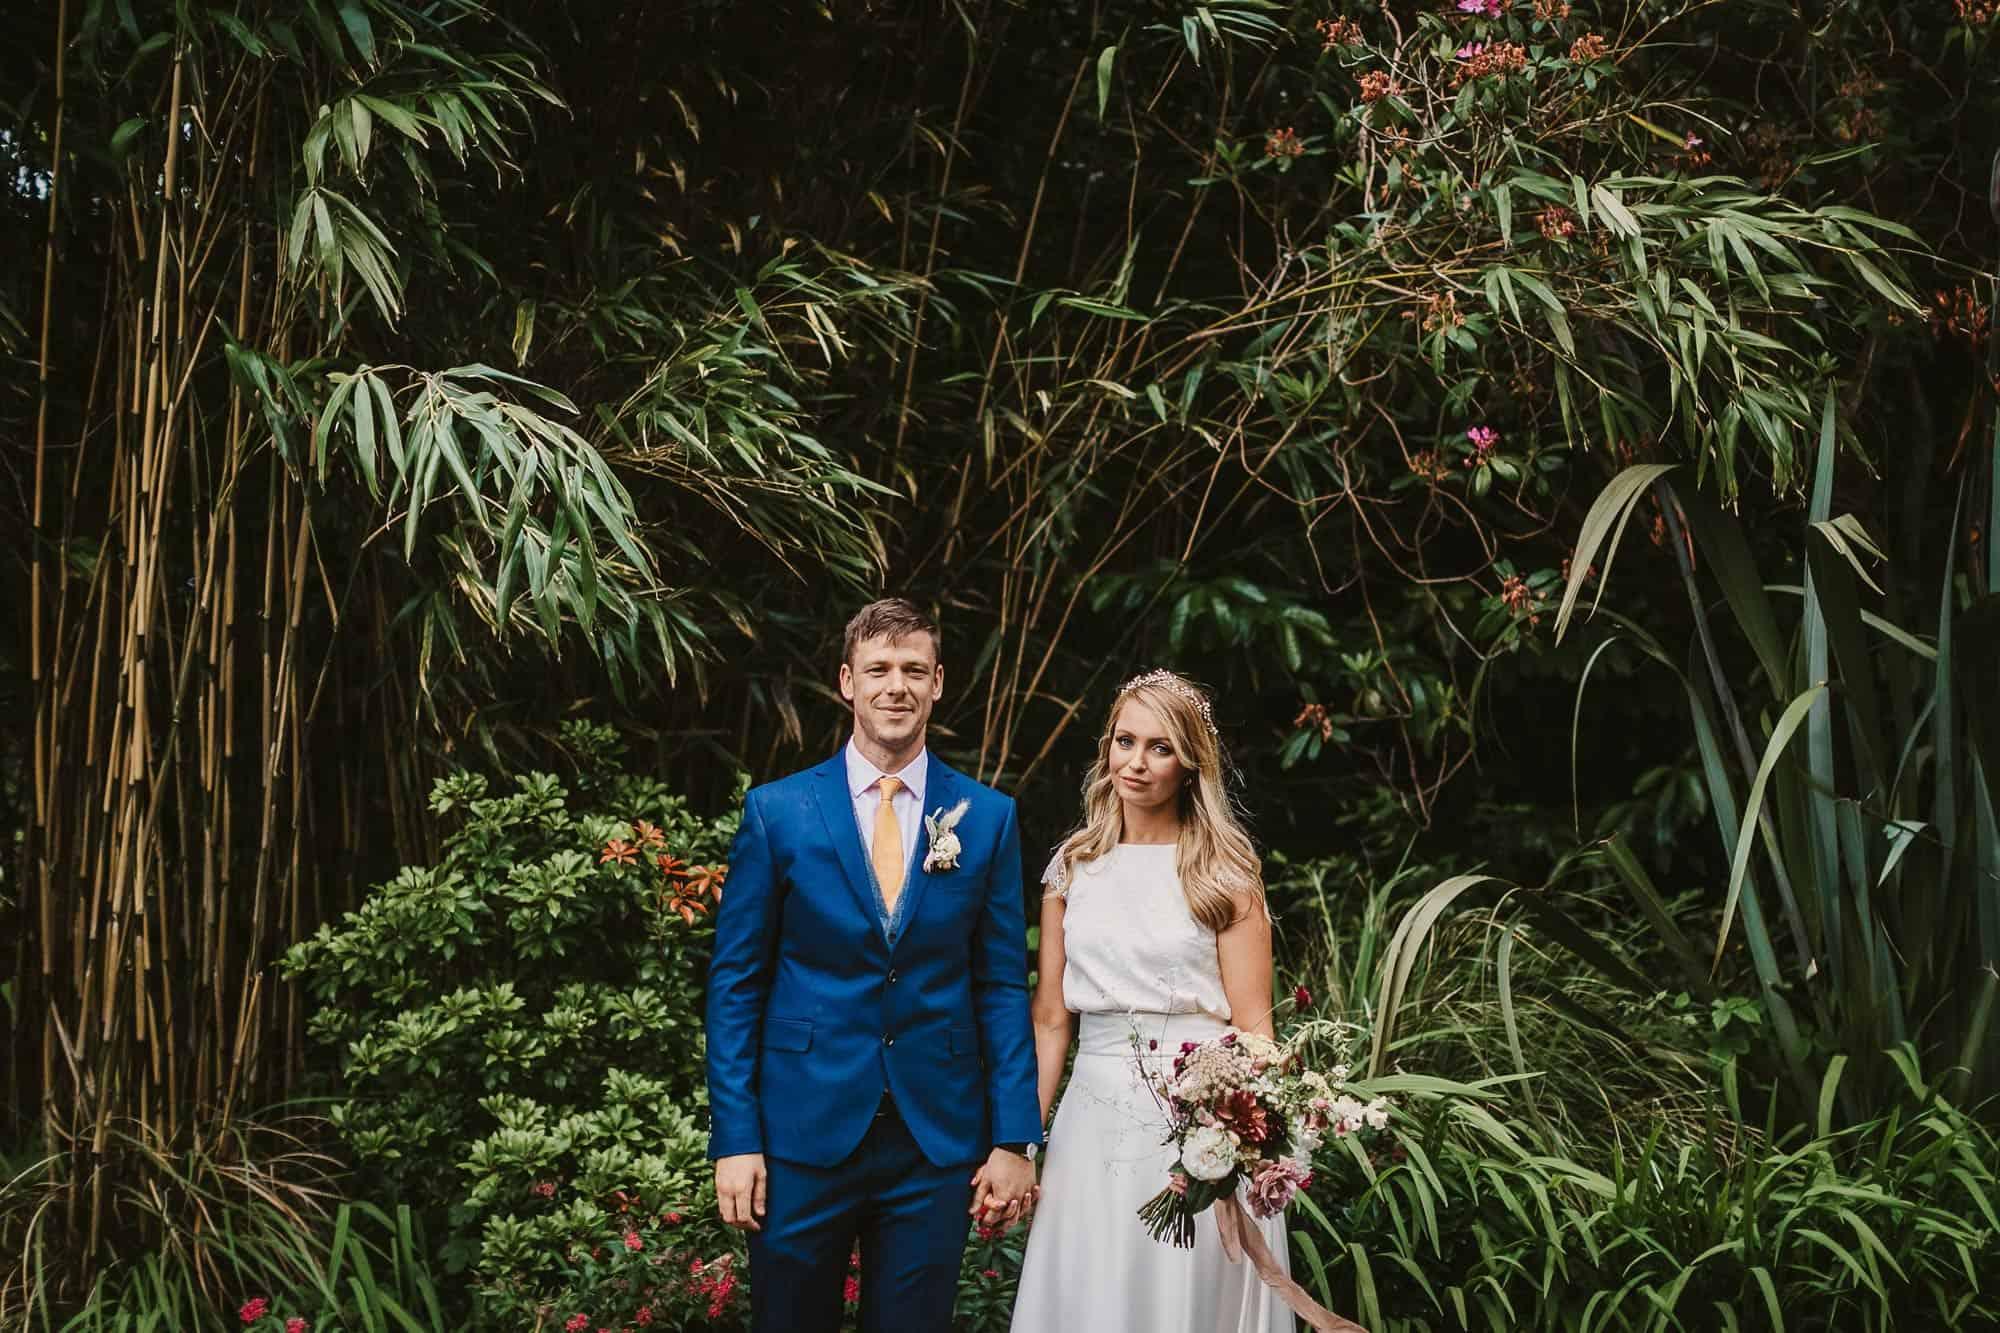 Elopement Ireland Connemara Nature Shoot, couple hold hands under trees